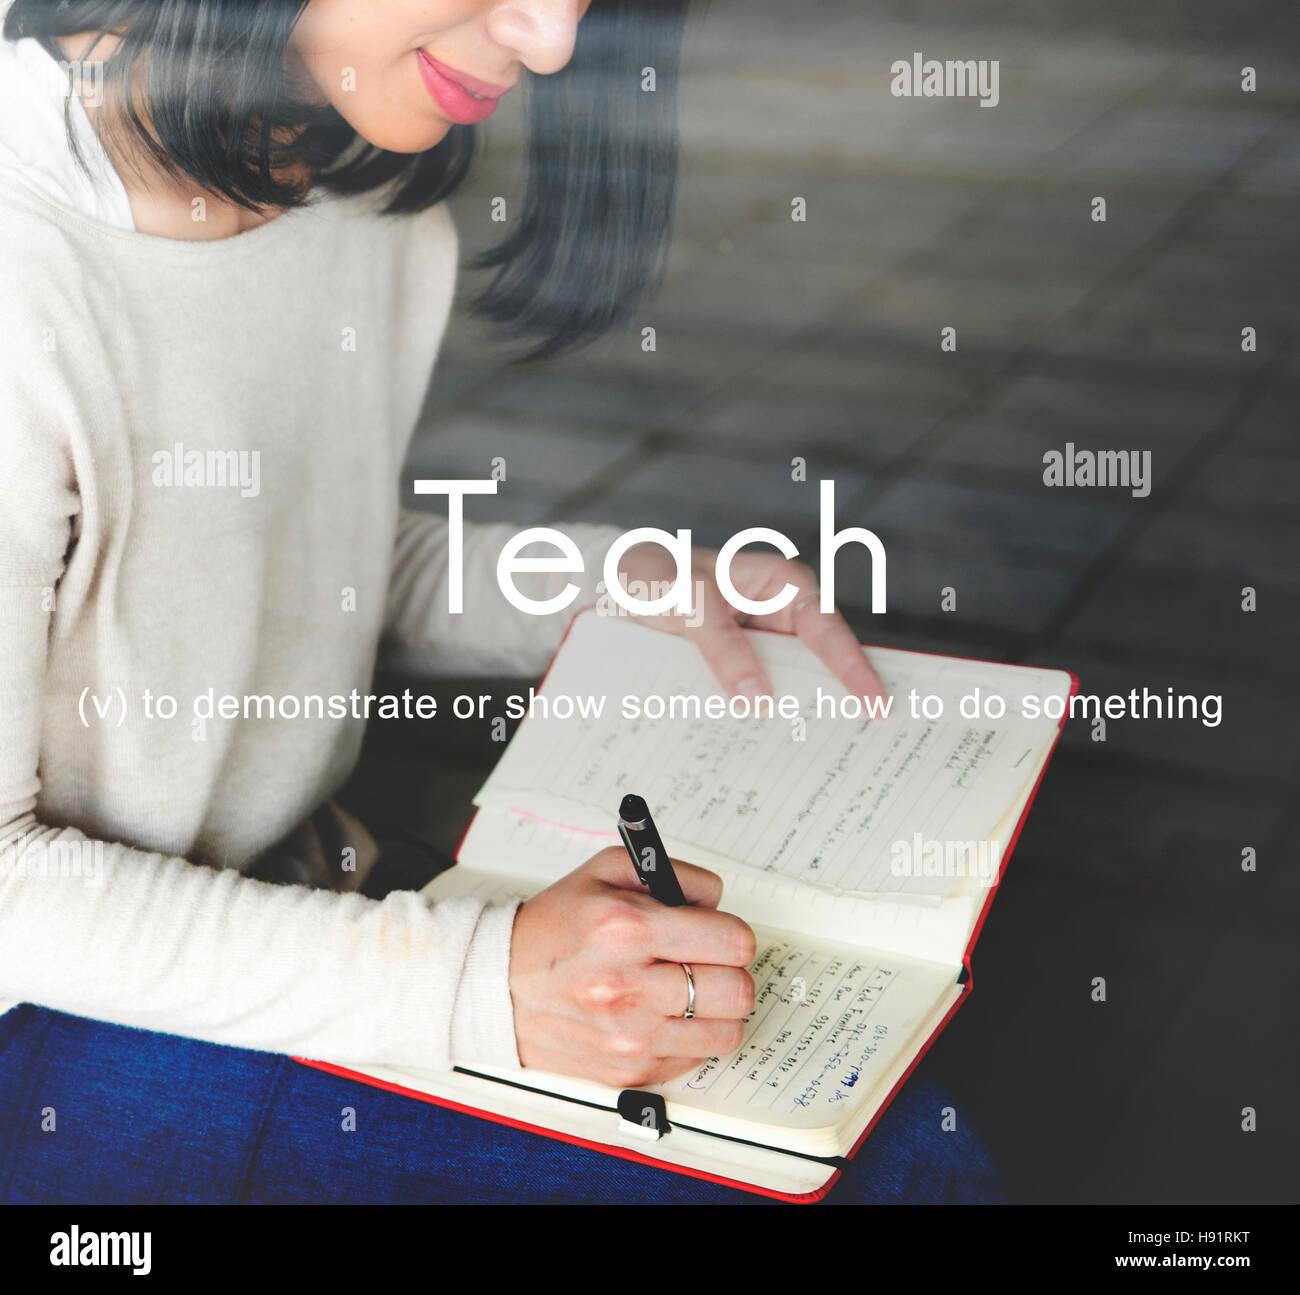 Teach Teaching Education Mentoring Coaching Training Concept - Stock Image